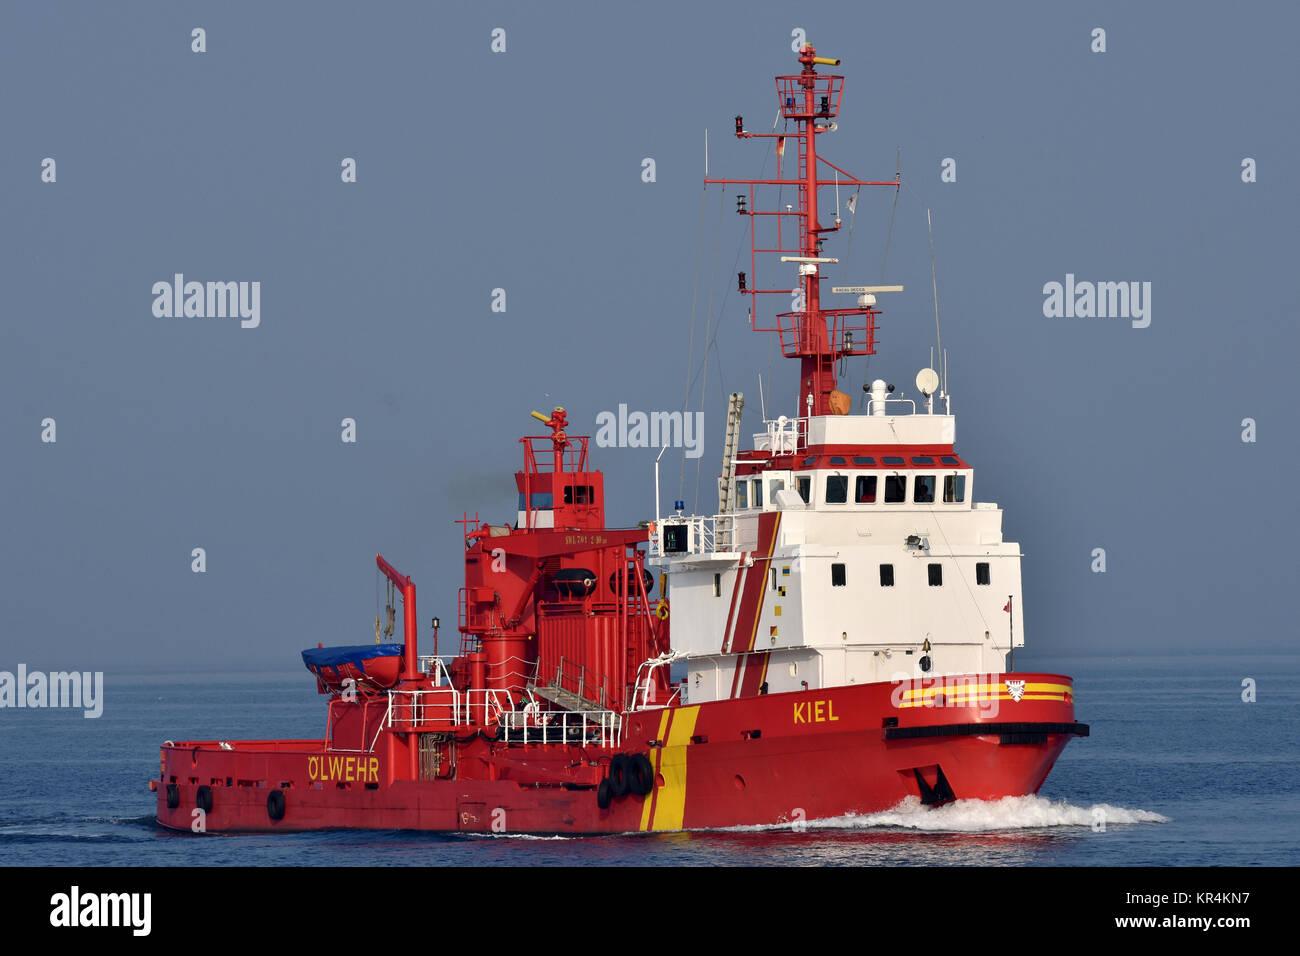 Pollution Control Vessel Kiel - Stock Image